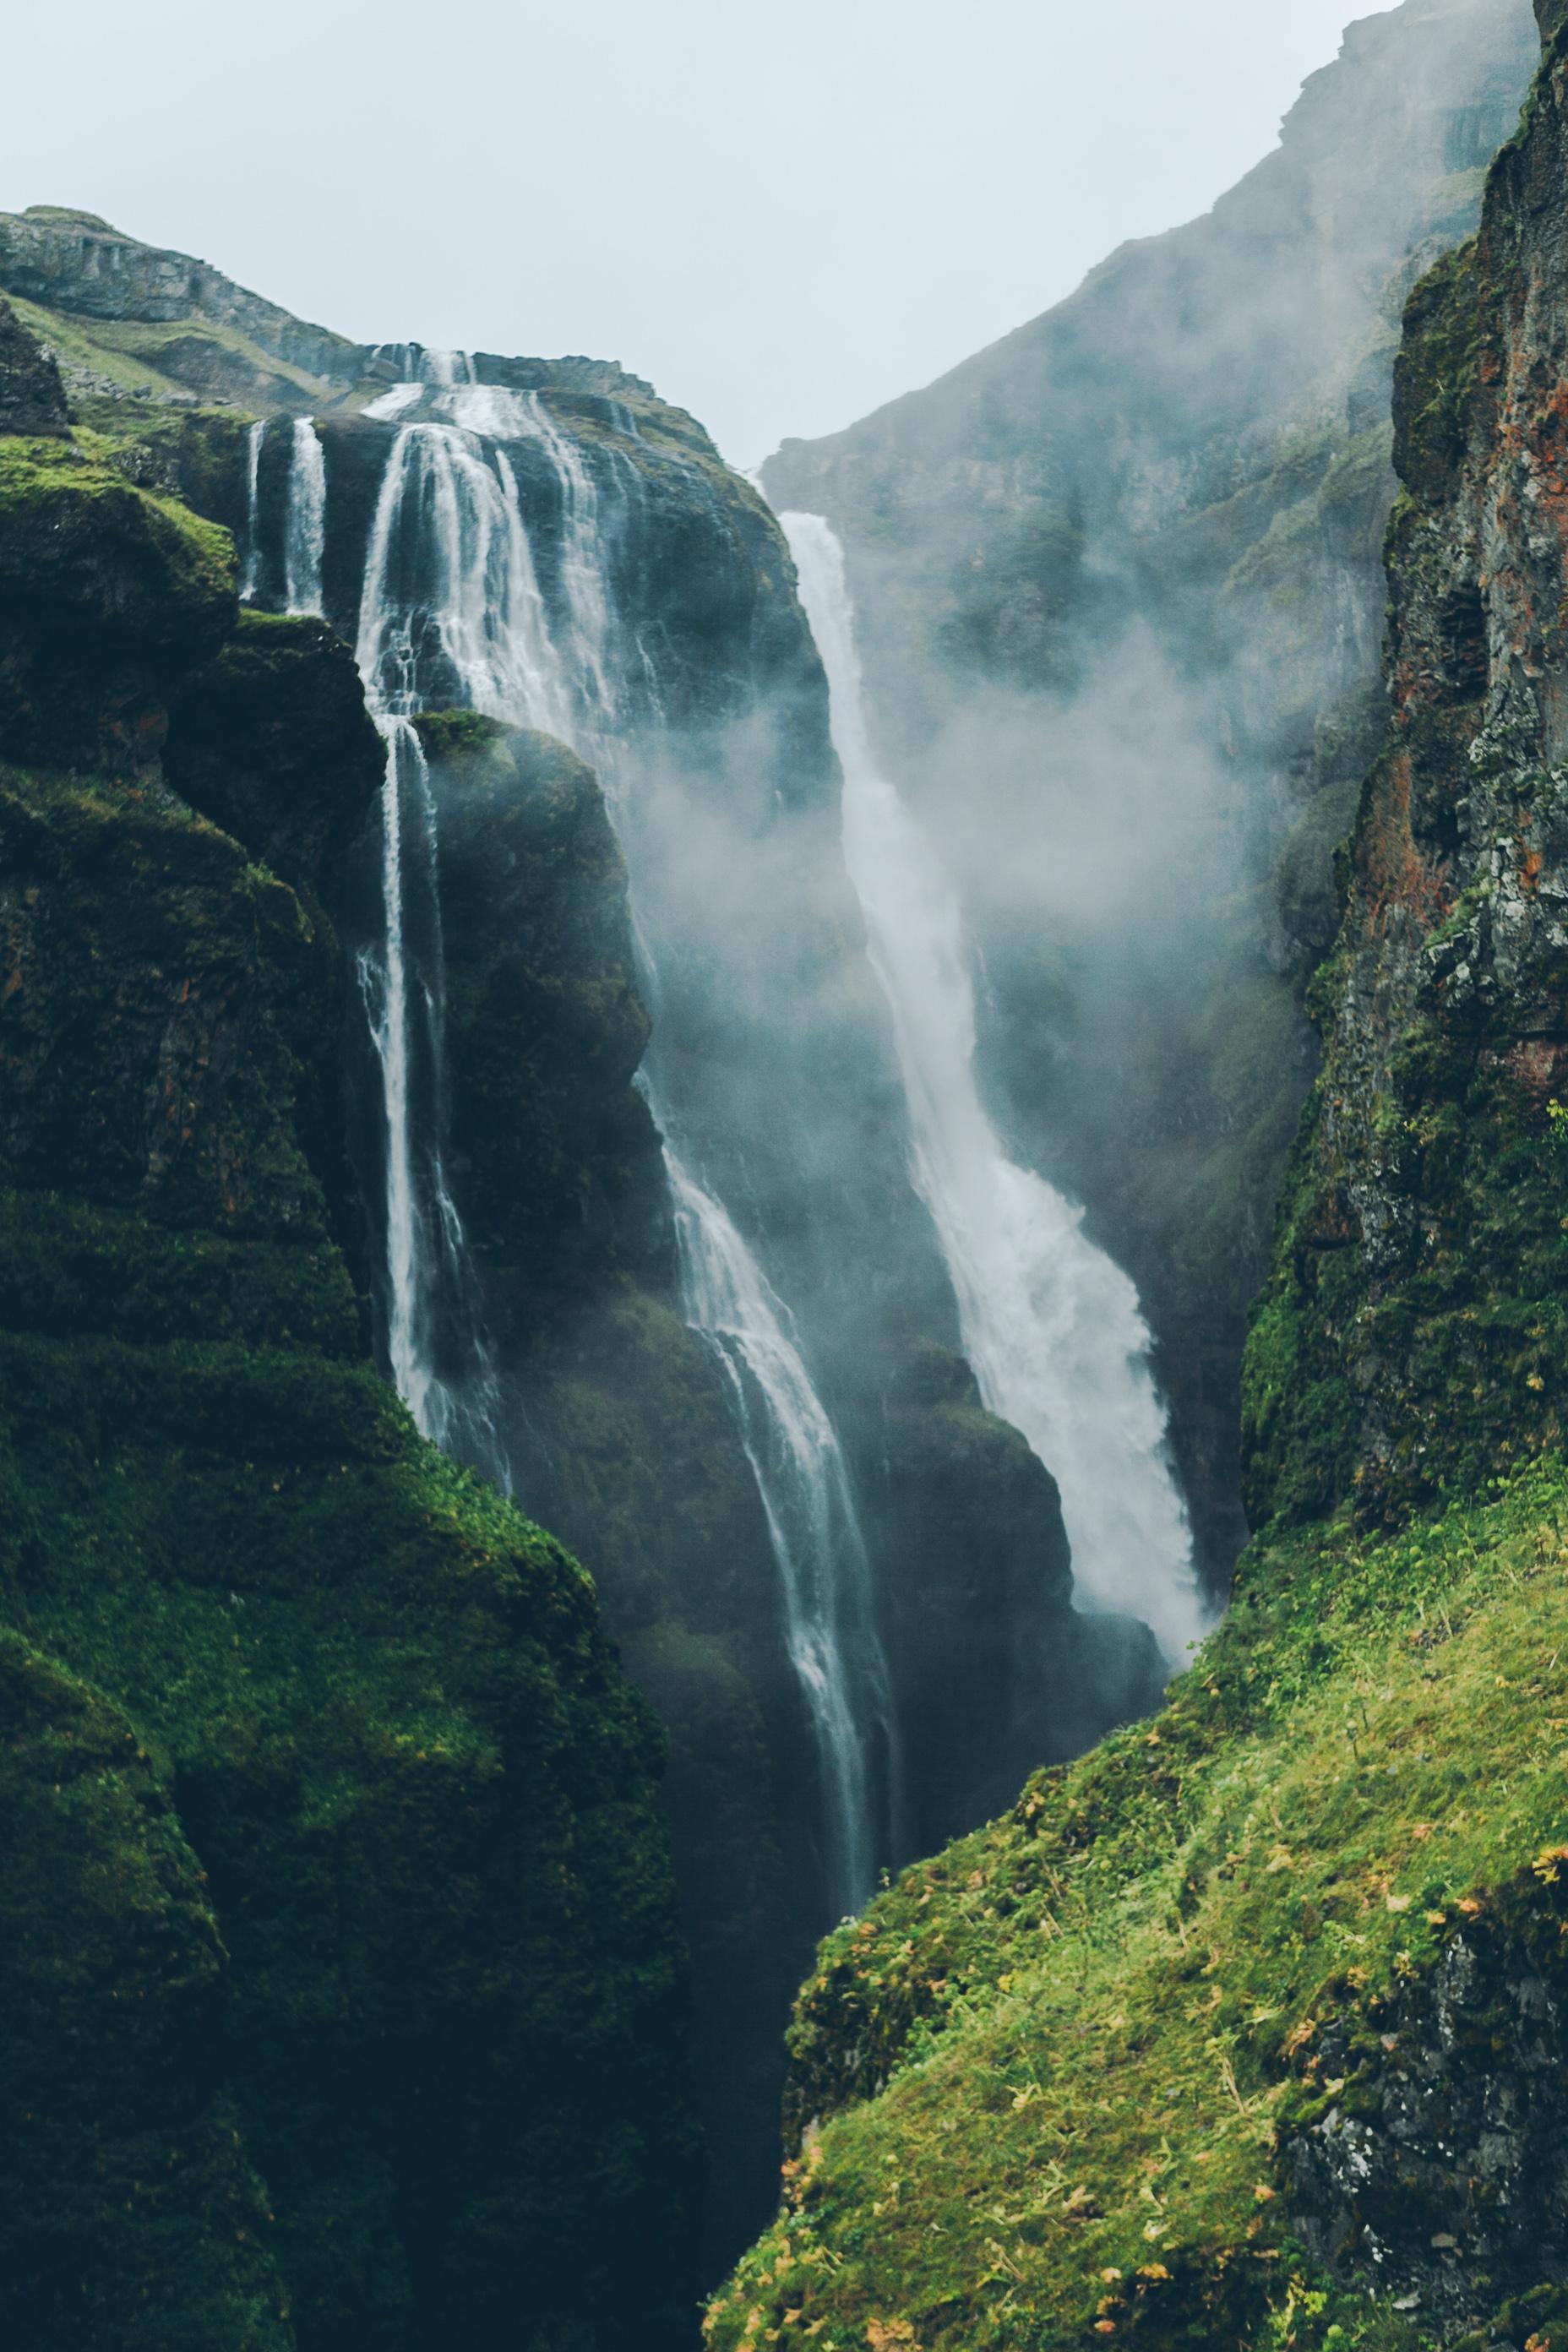 Gylmurfoss - Iceland's highest waterfall